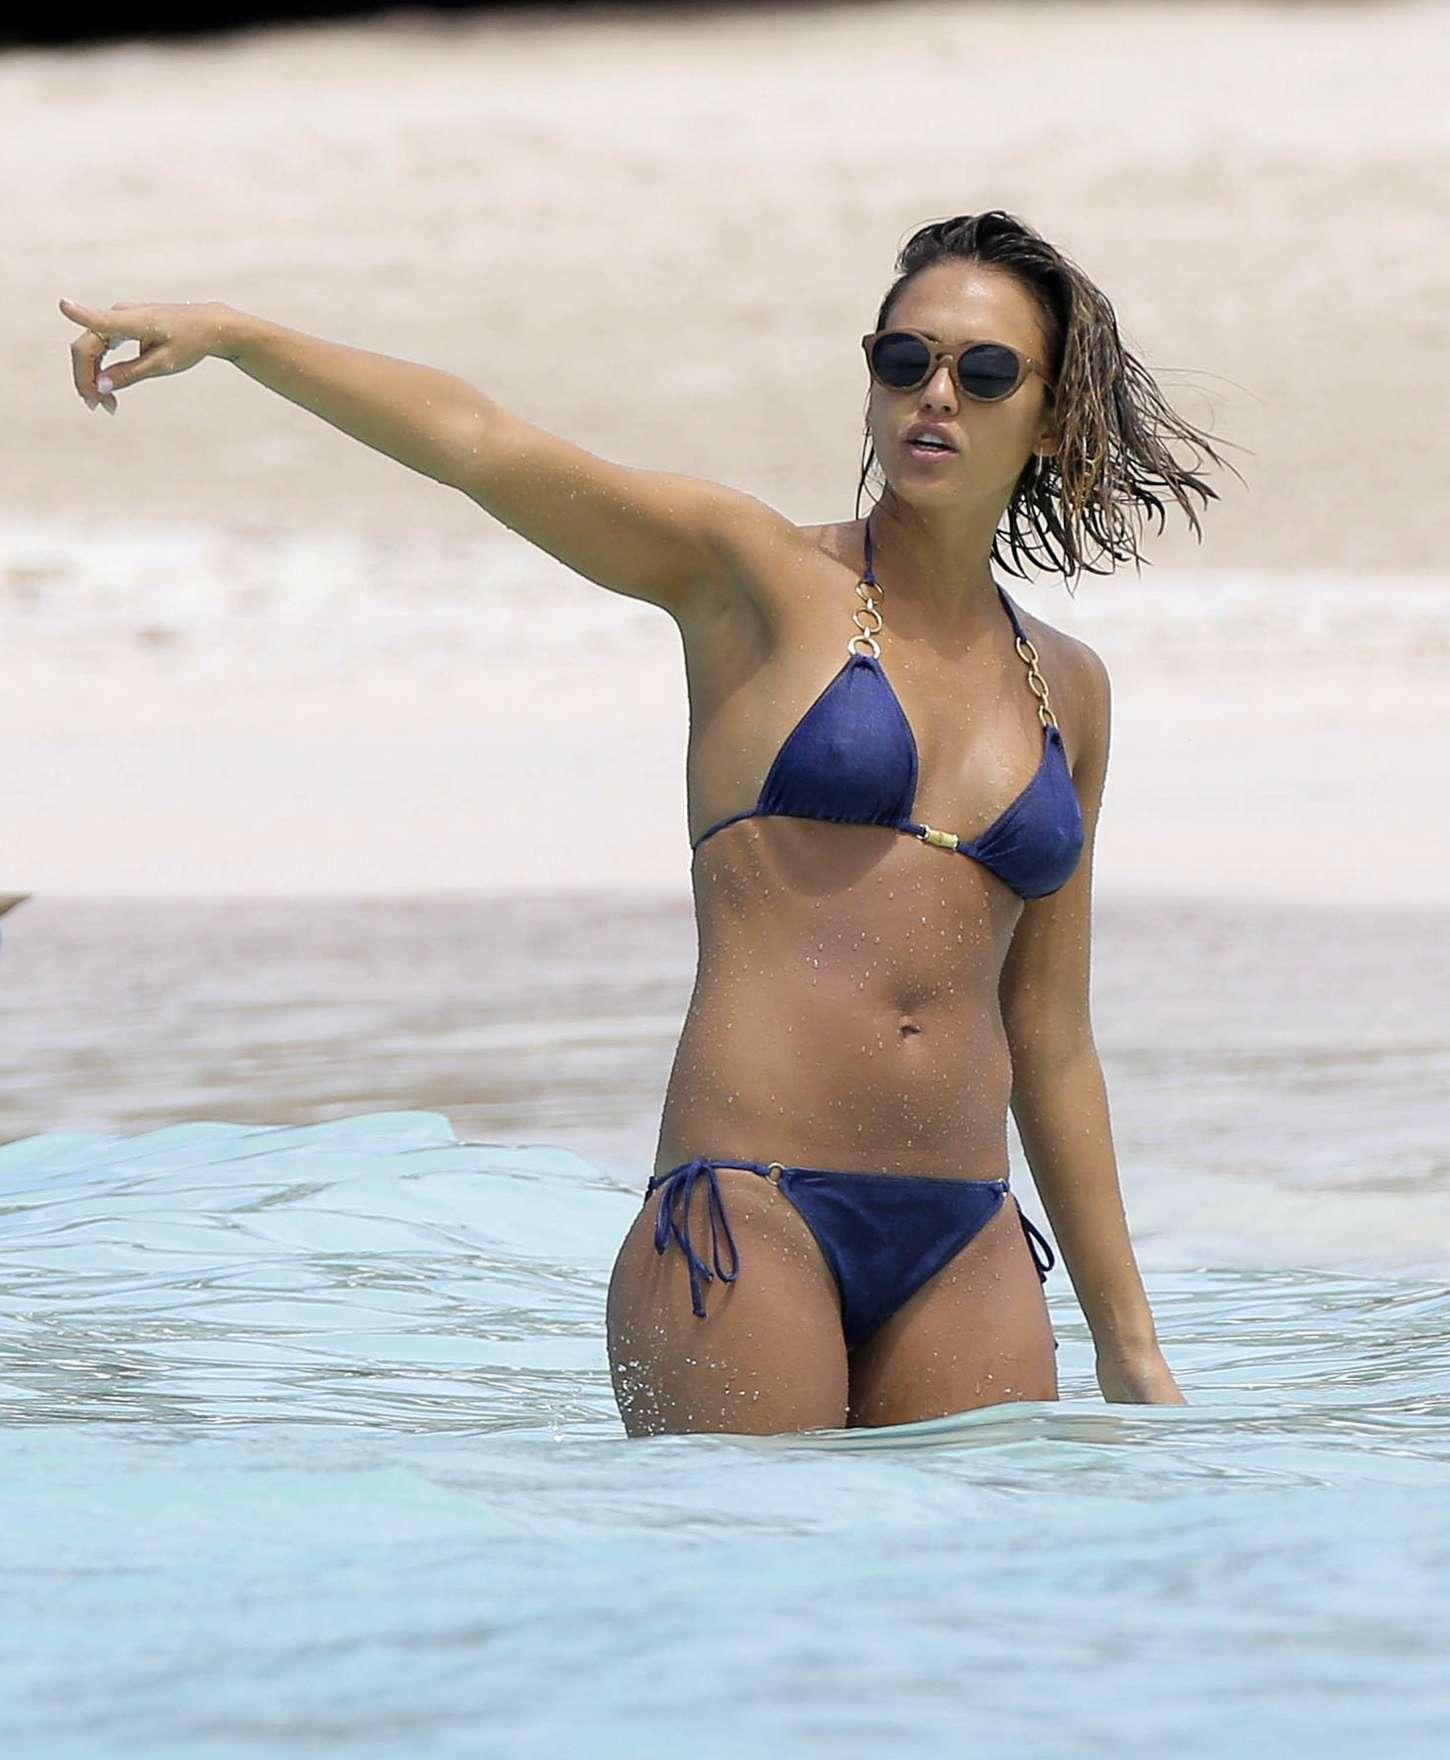 Bikini Indianara Carvalho nudes (23 foto and video), Ass, Is a cute, Feet, see through 2018